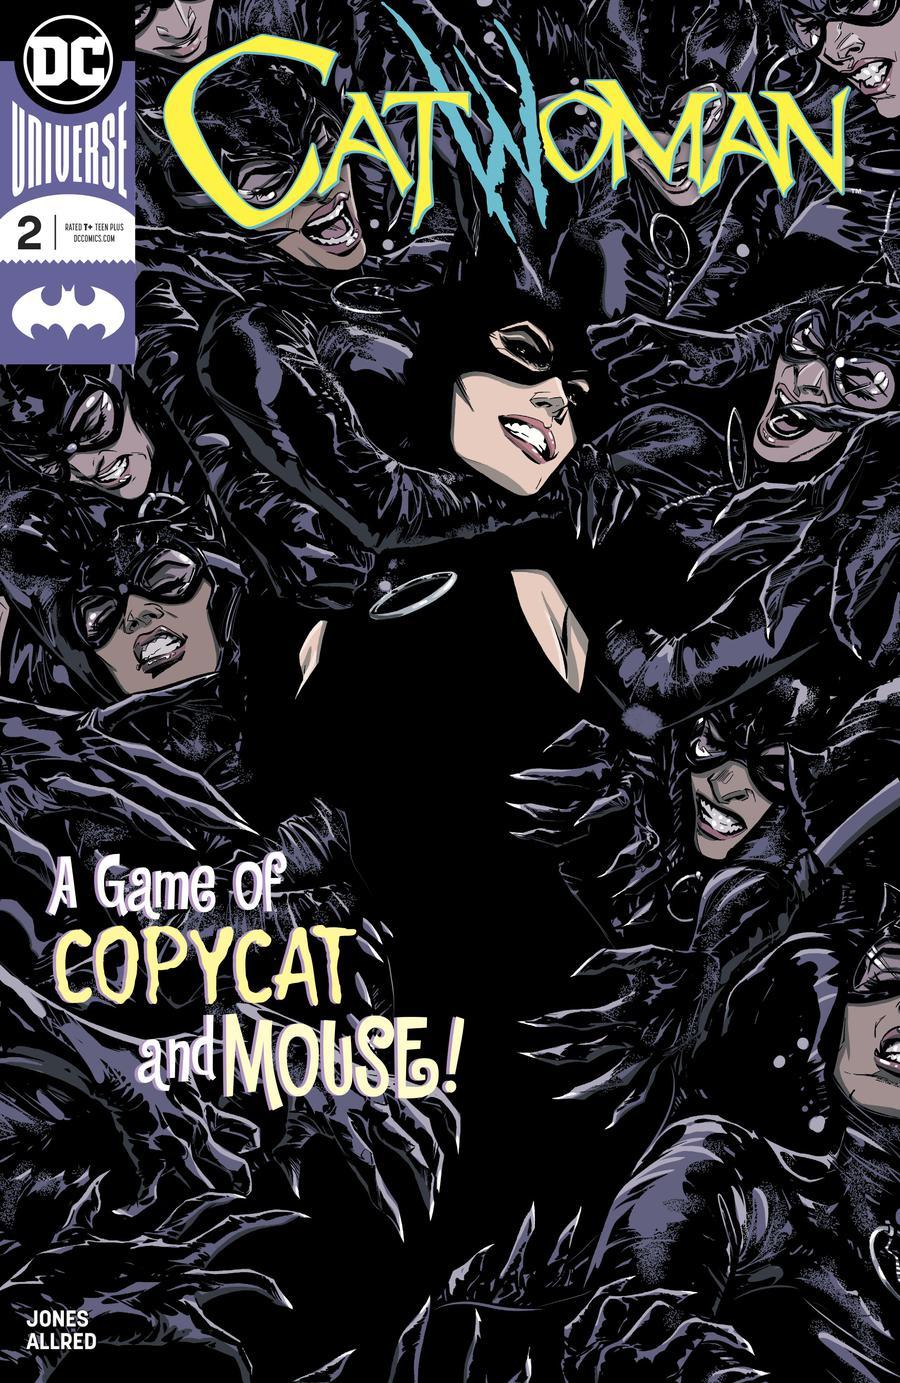 Catwoman Vol 5 #2 Cover A Regular Joelle Jones Cover